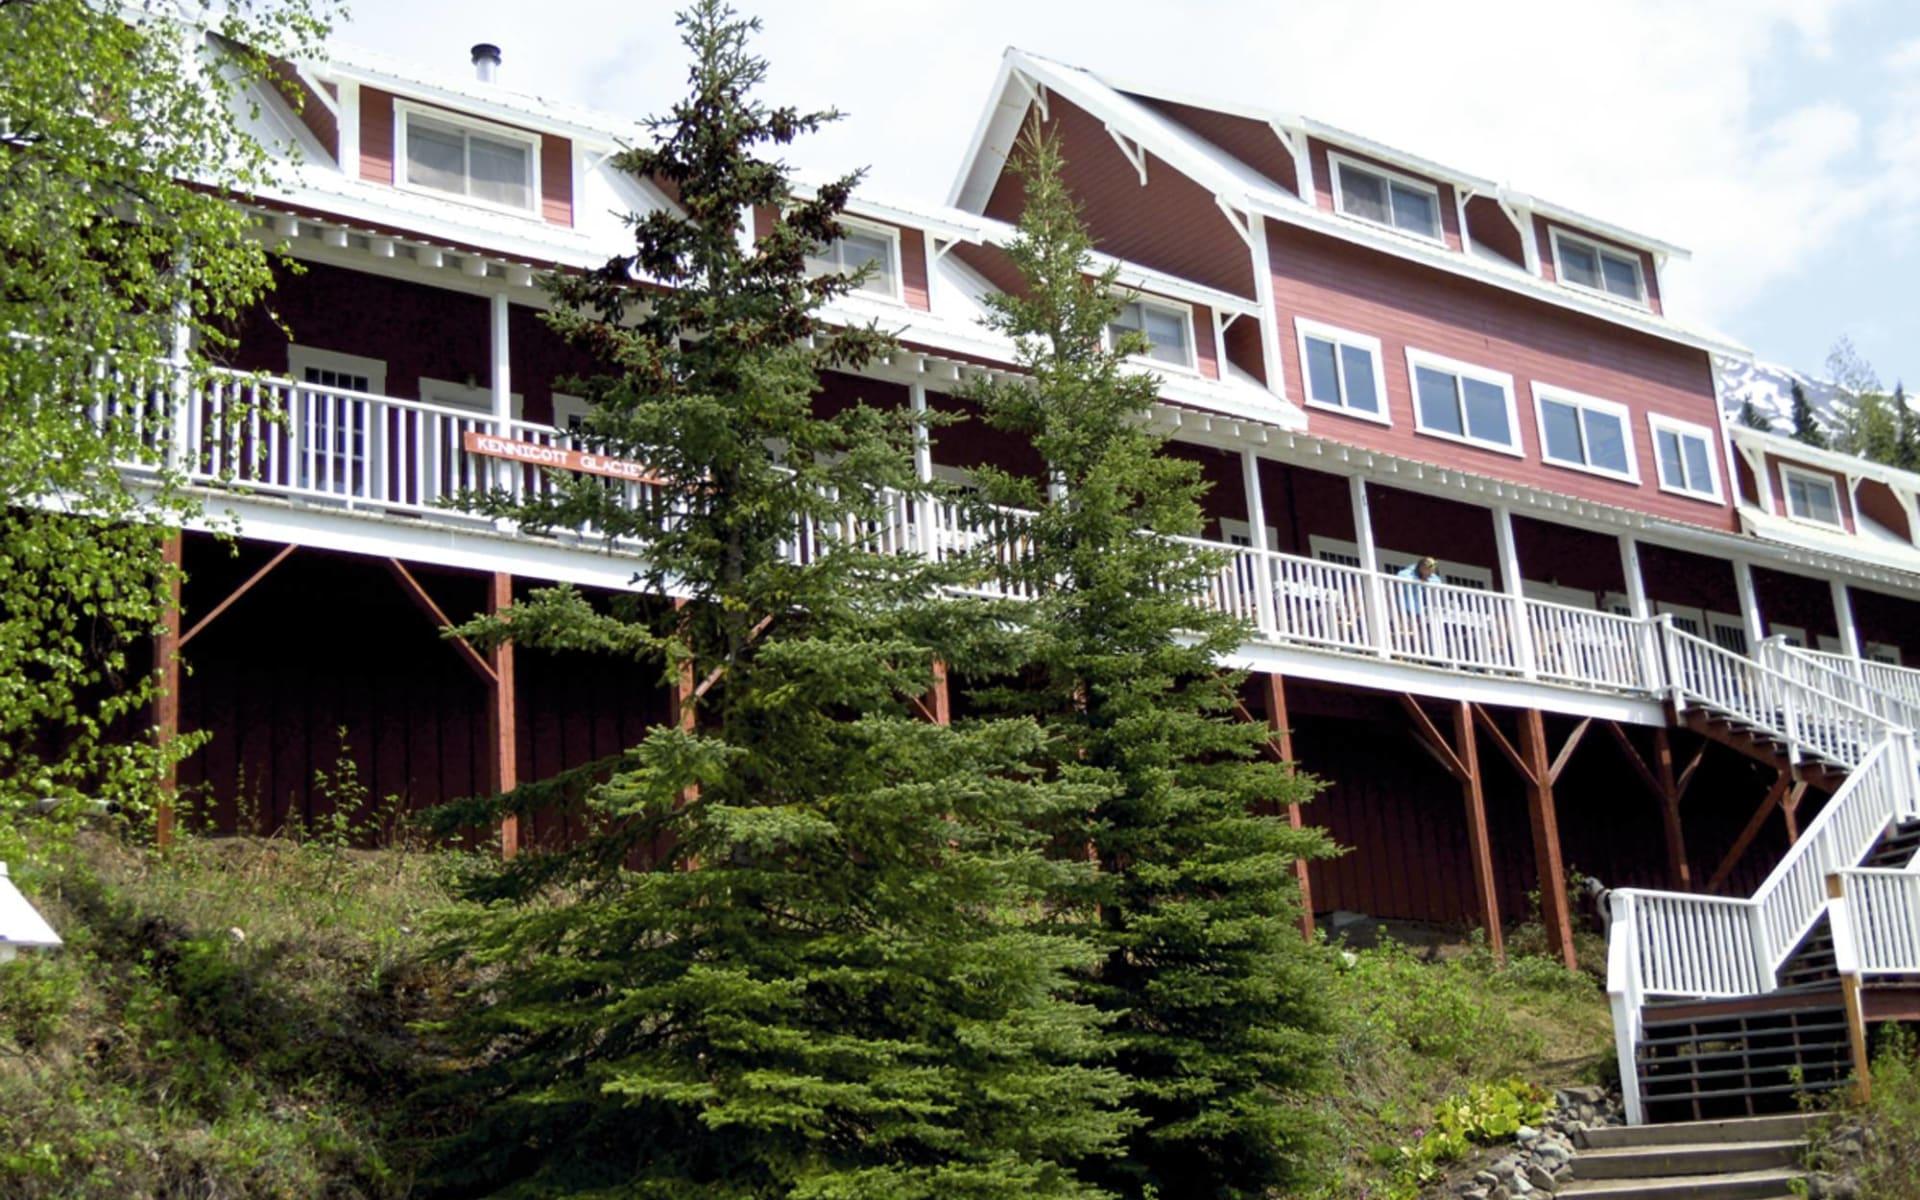 Kennicott Glacier Lodge in Wrangell-St. Elias National Park:  2012_082_02_Kennicott Glacier Lodge